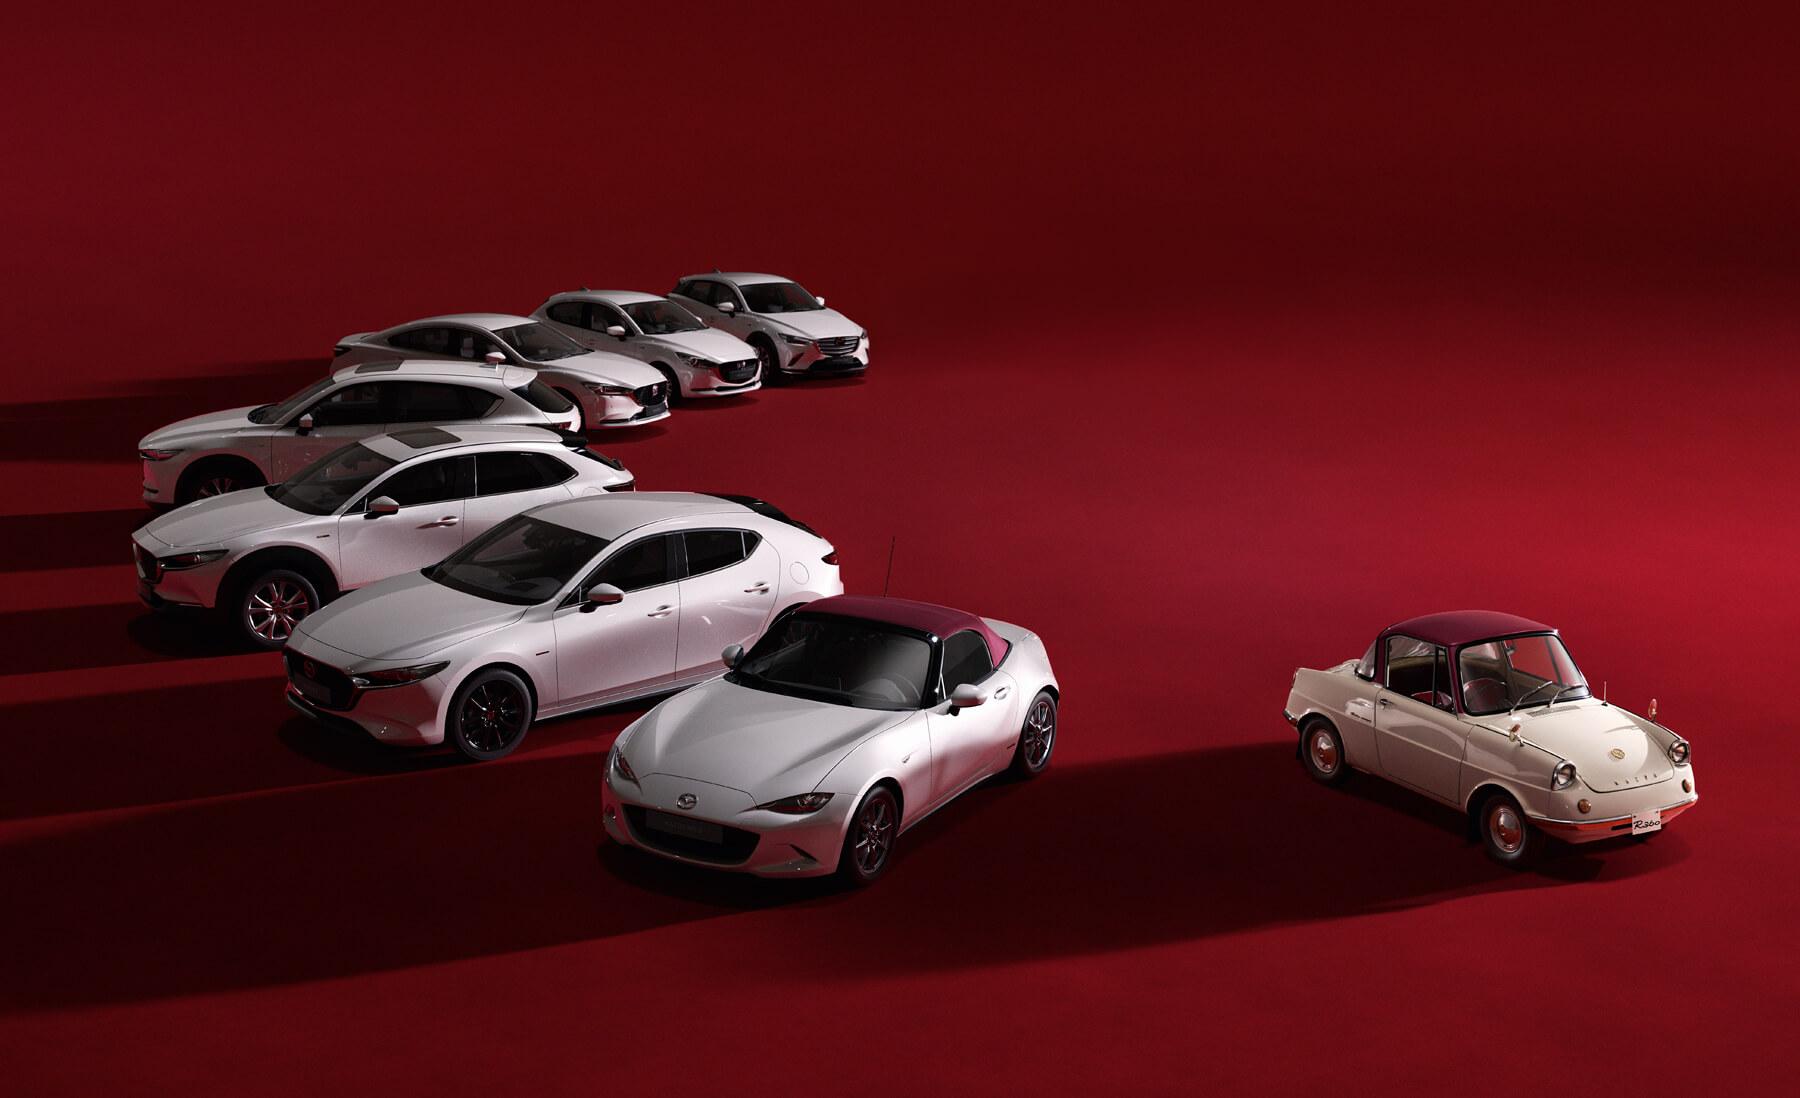 https://krissmer.mazda.at/wp-content/uploads/sites/100/2020/09/Mazda_100th_Range_1800x1098px.jpg